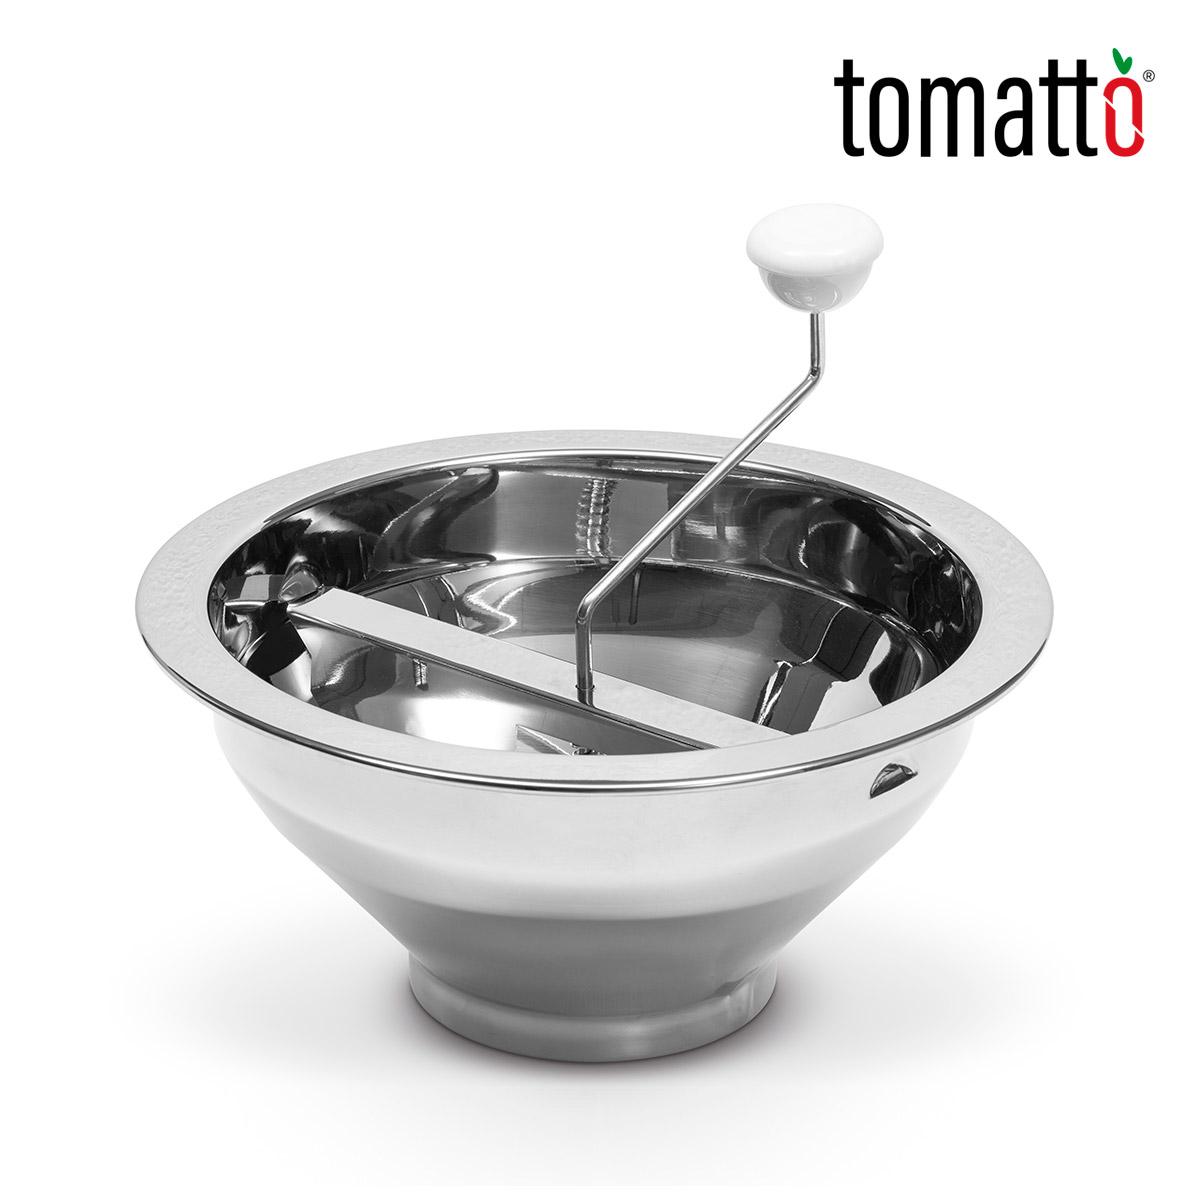 Pasaverduras Profesional de Acero Inoxidable Marca Italiana Tomatto